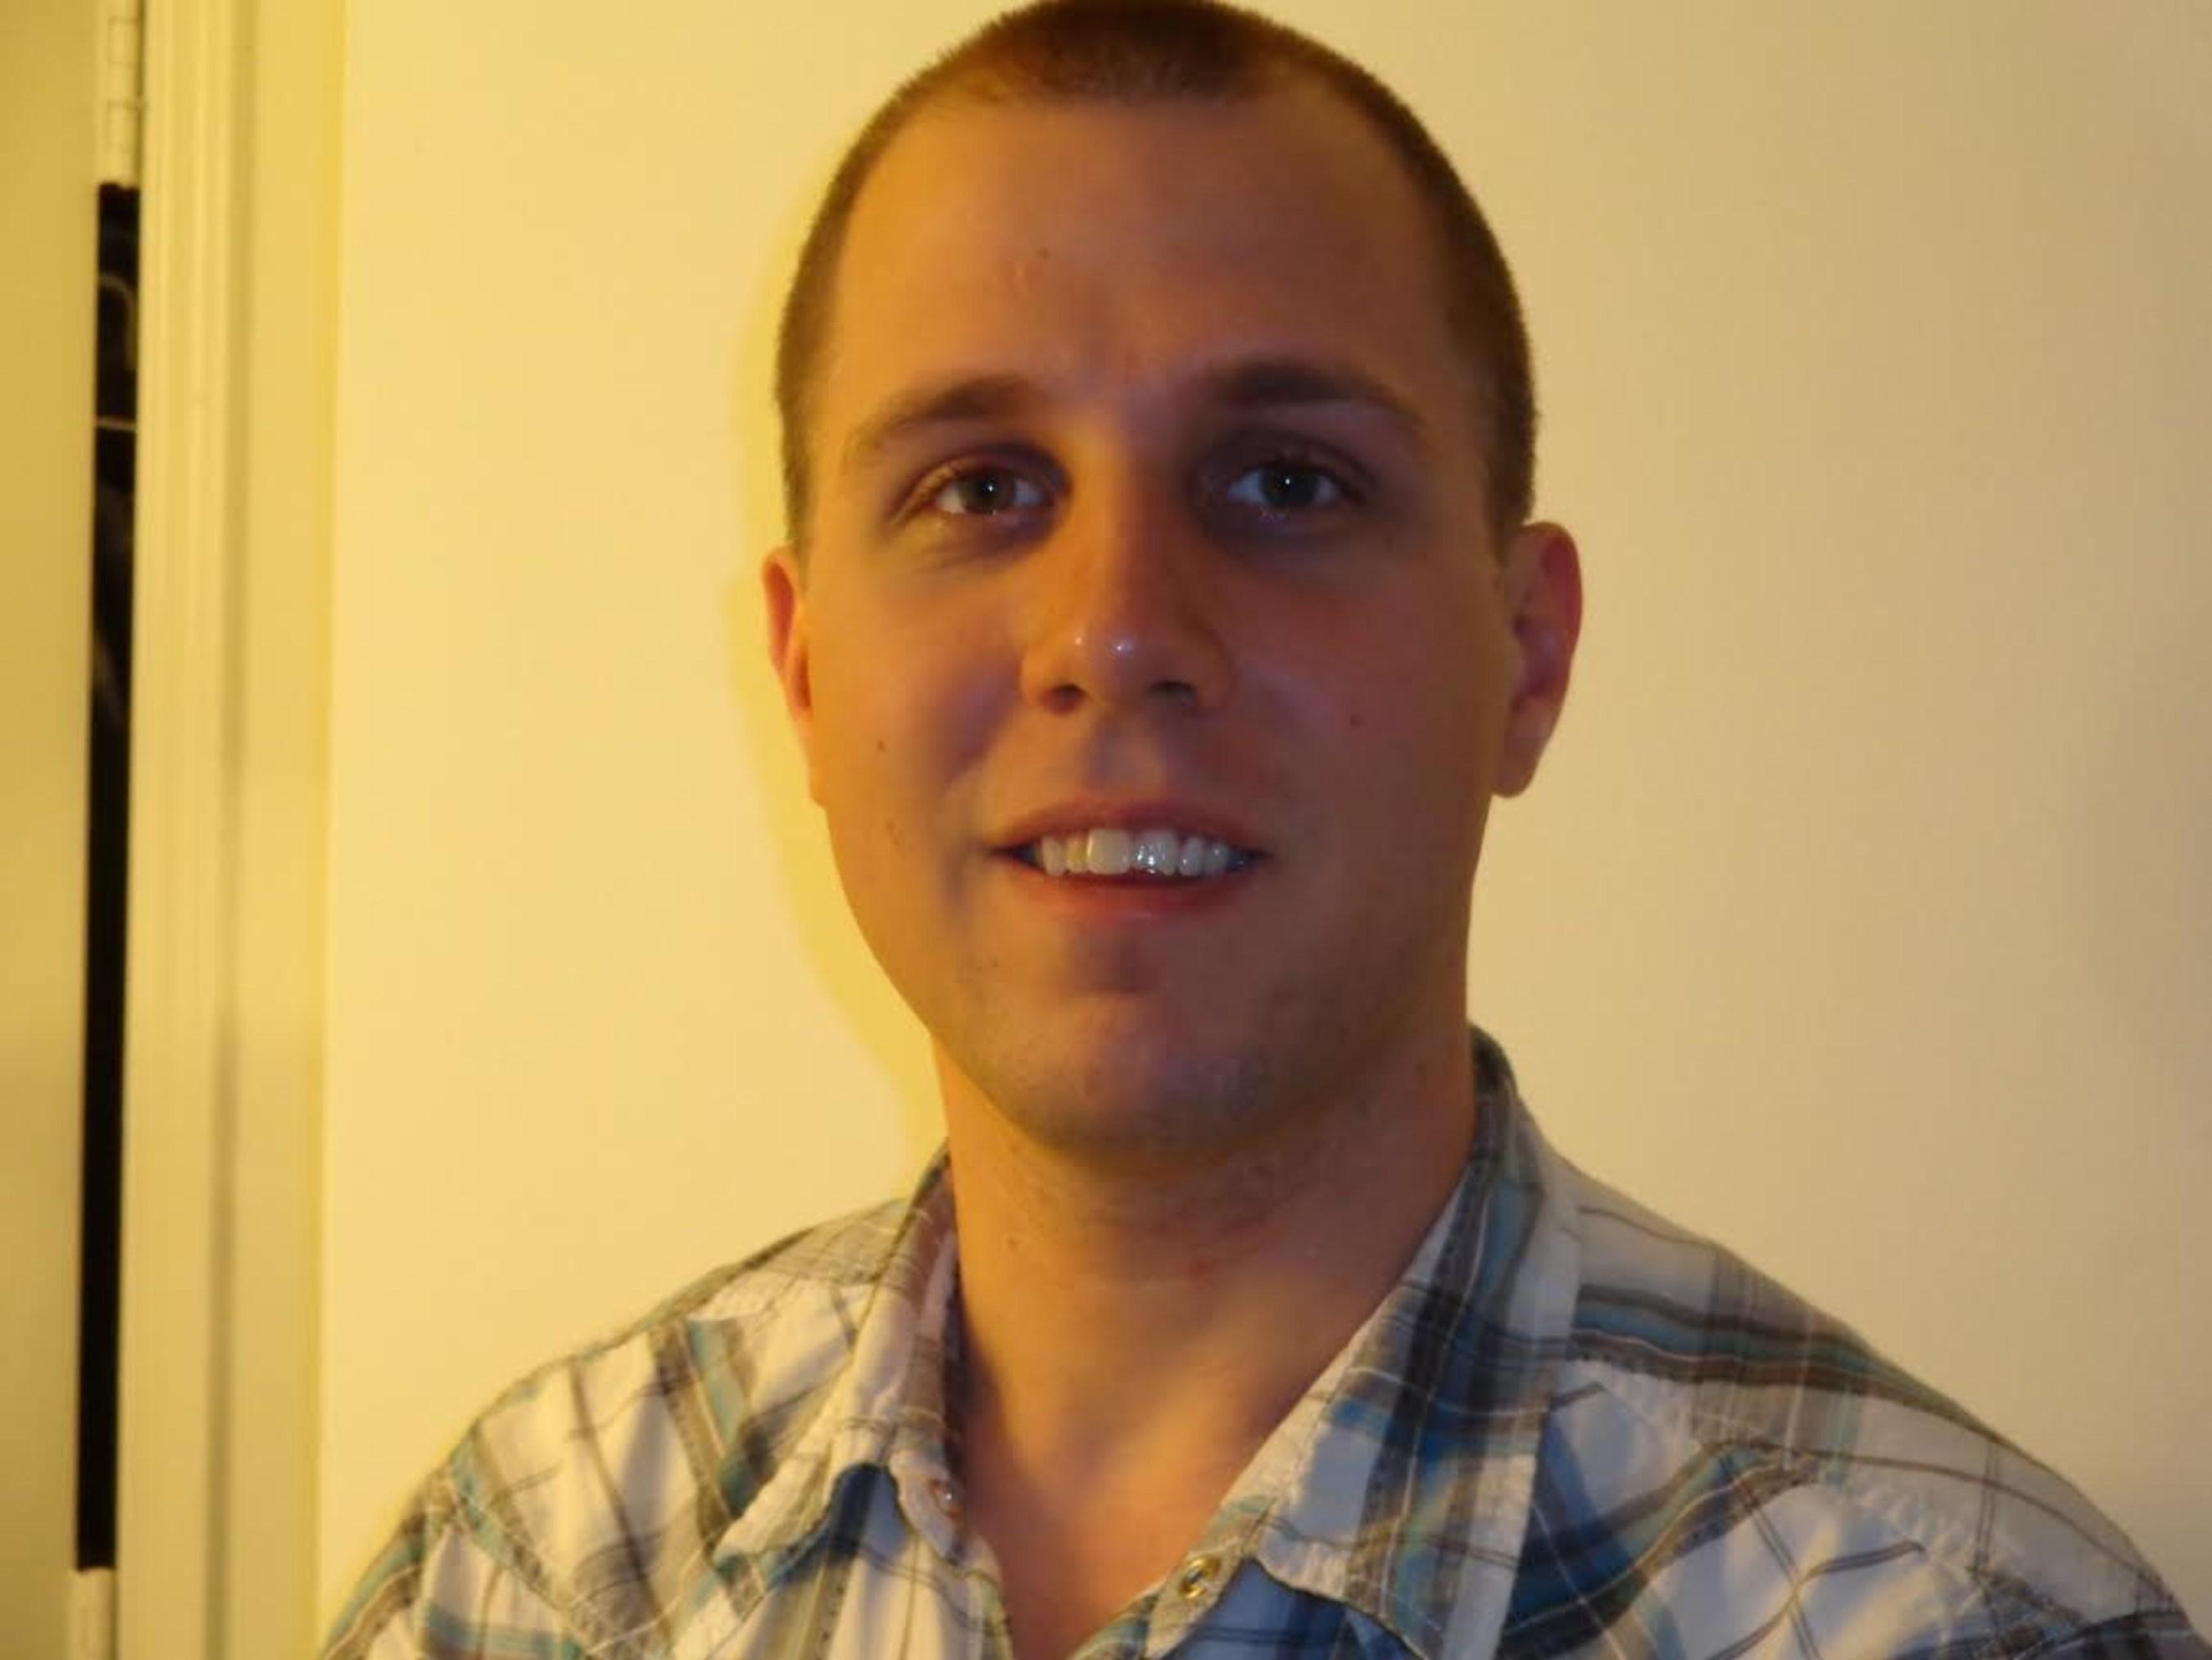 McGowan's Heating and Air Conditioning Awards Scholarship to Robert Peters of North Carolina